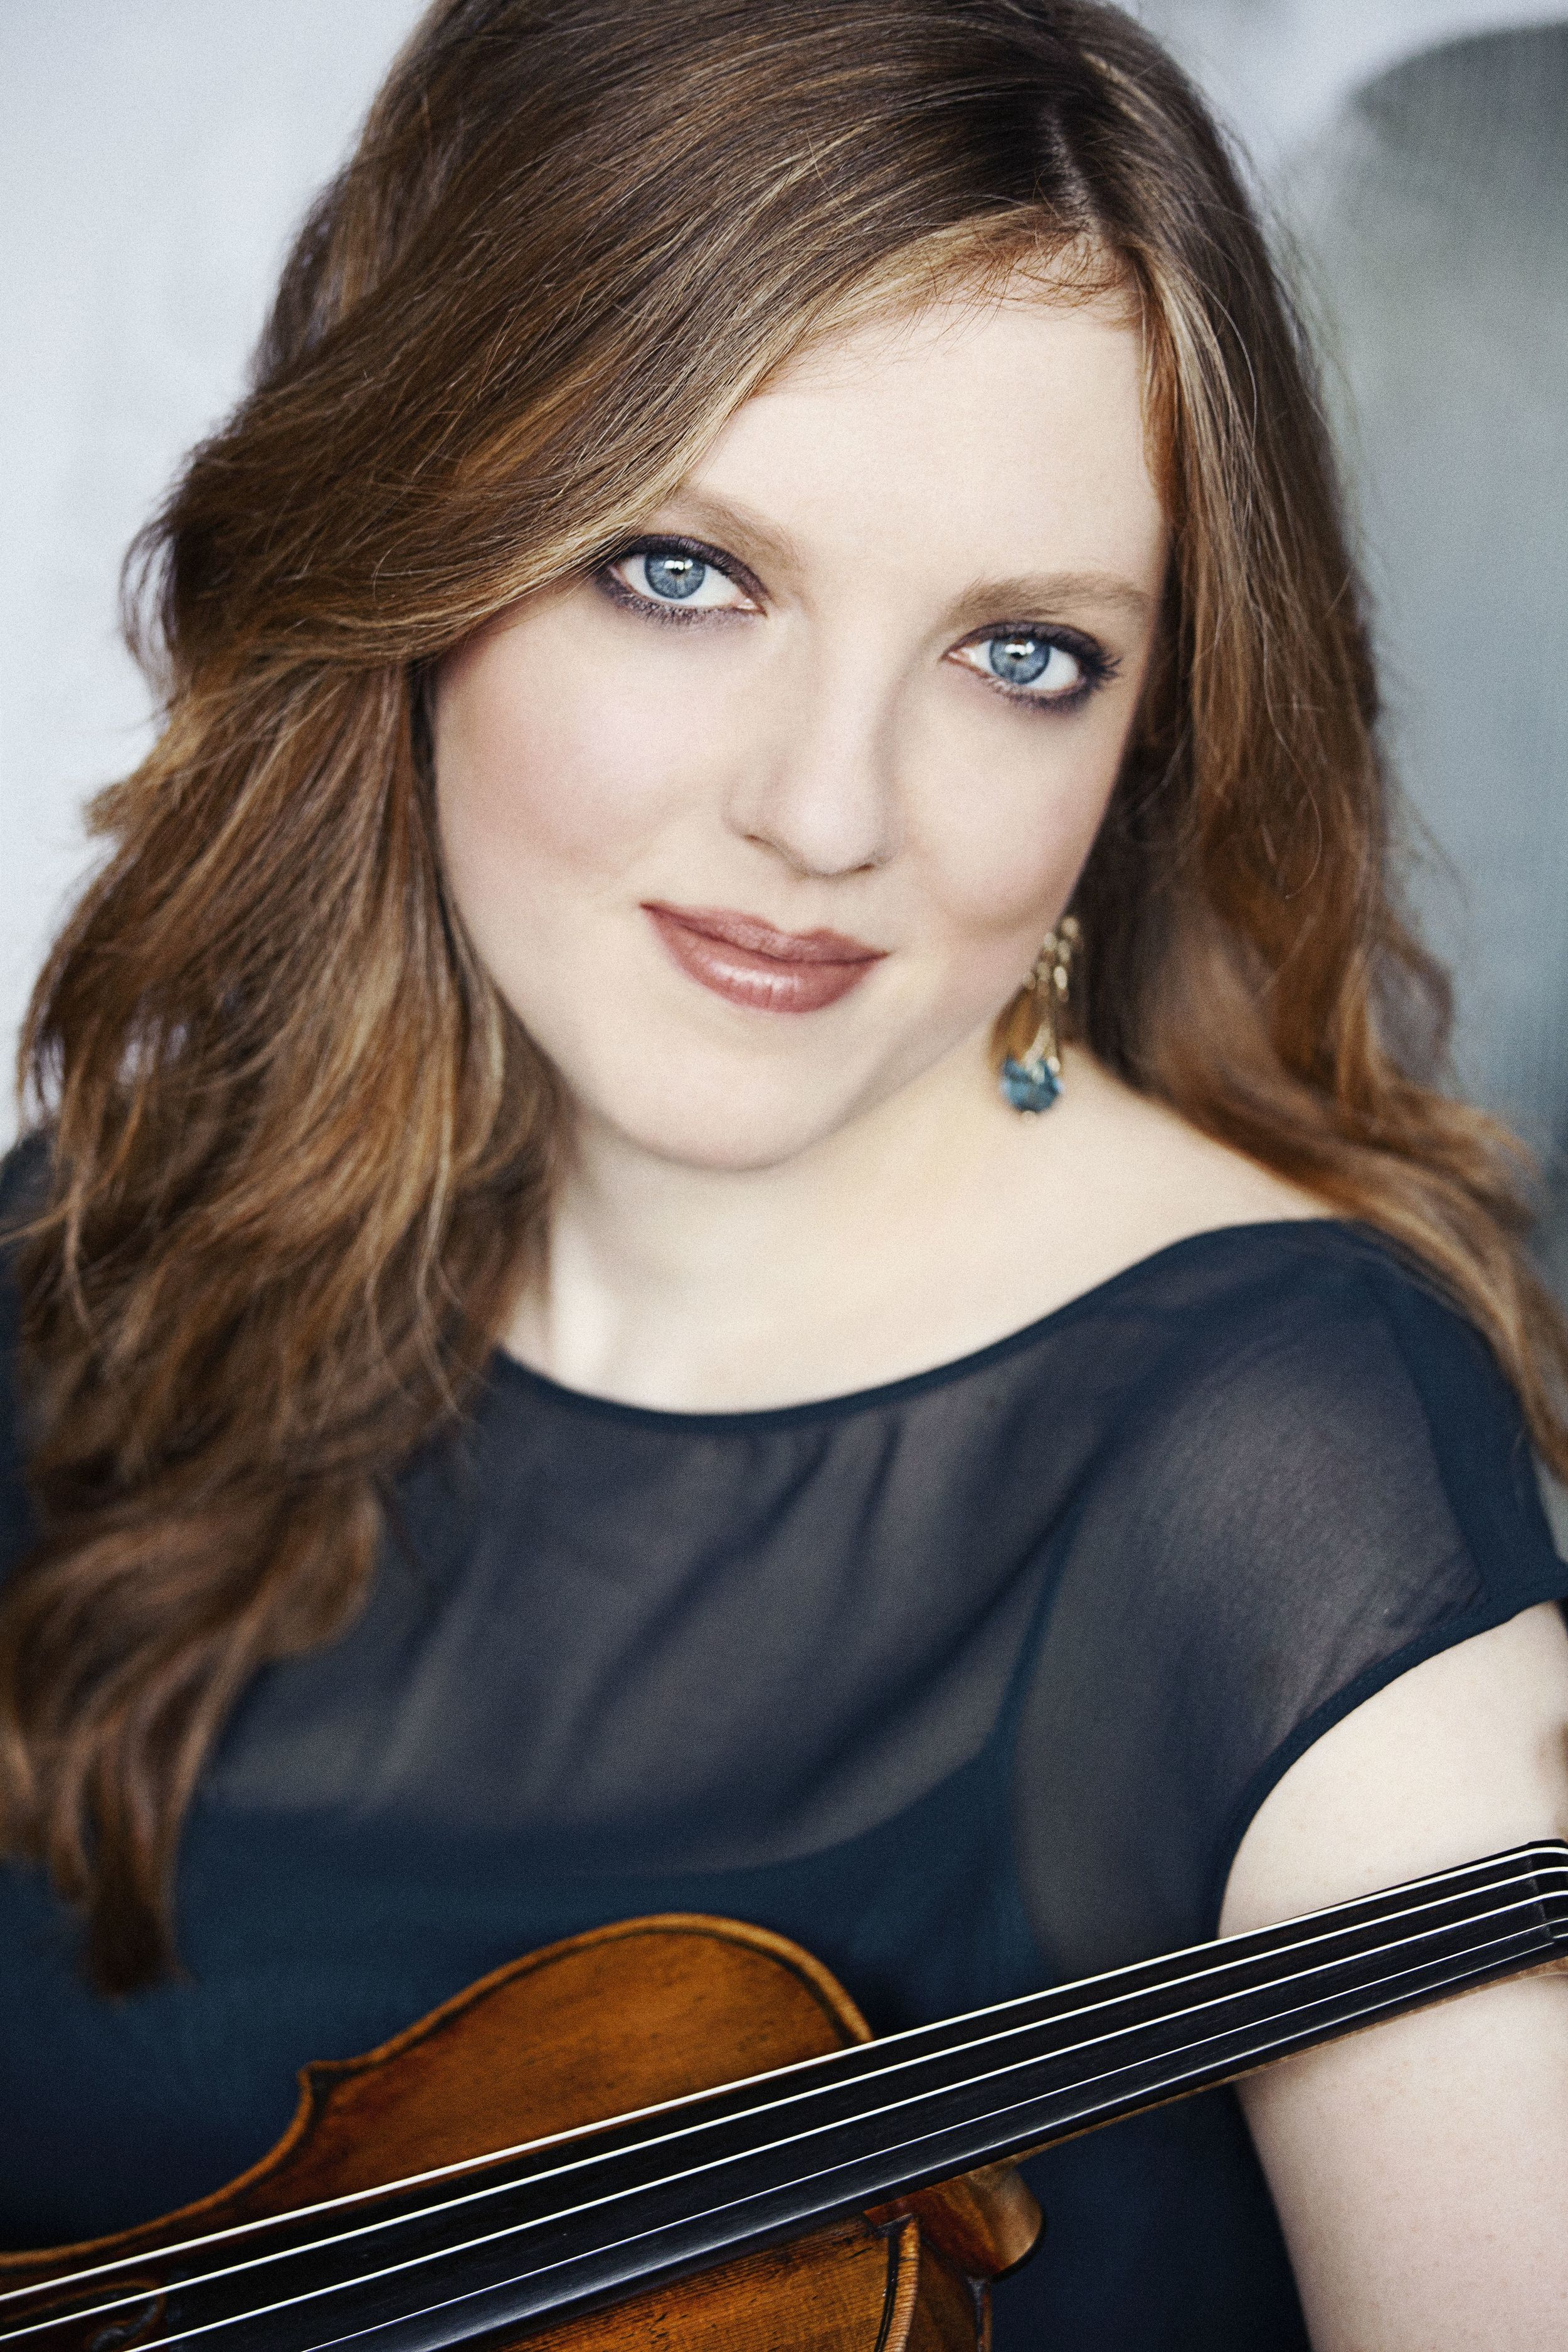 Rachel Barton Pine, guest violinist